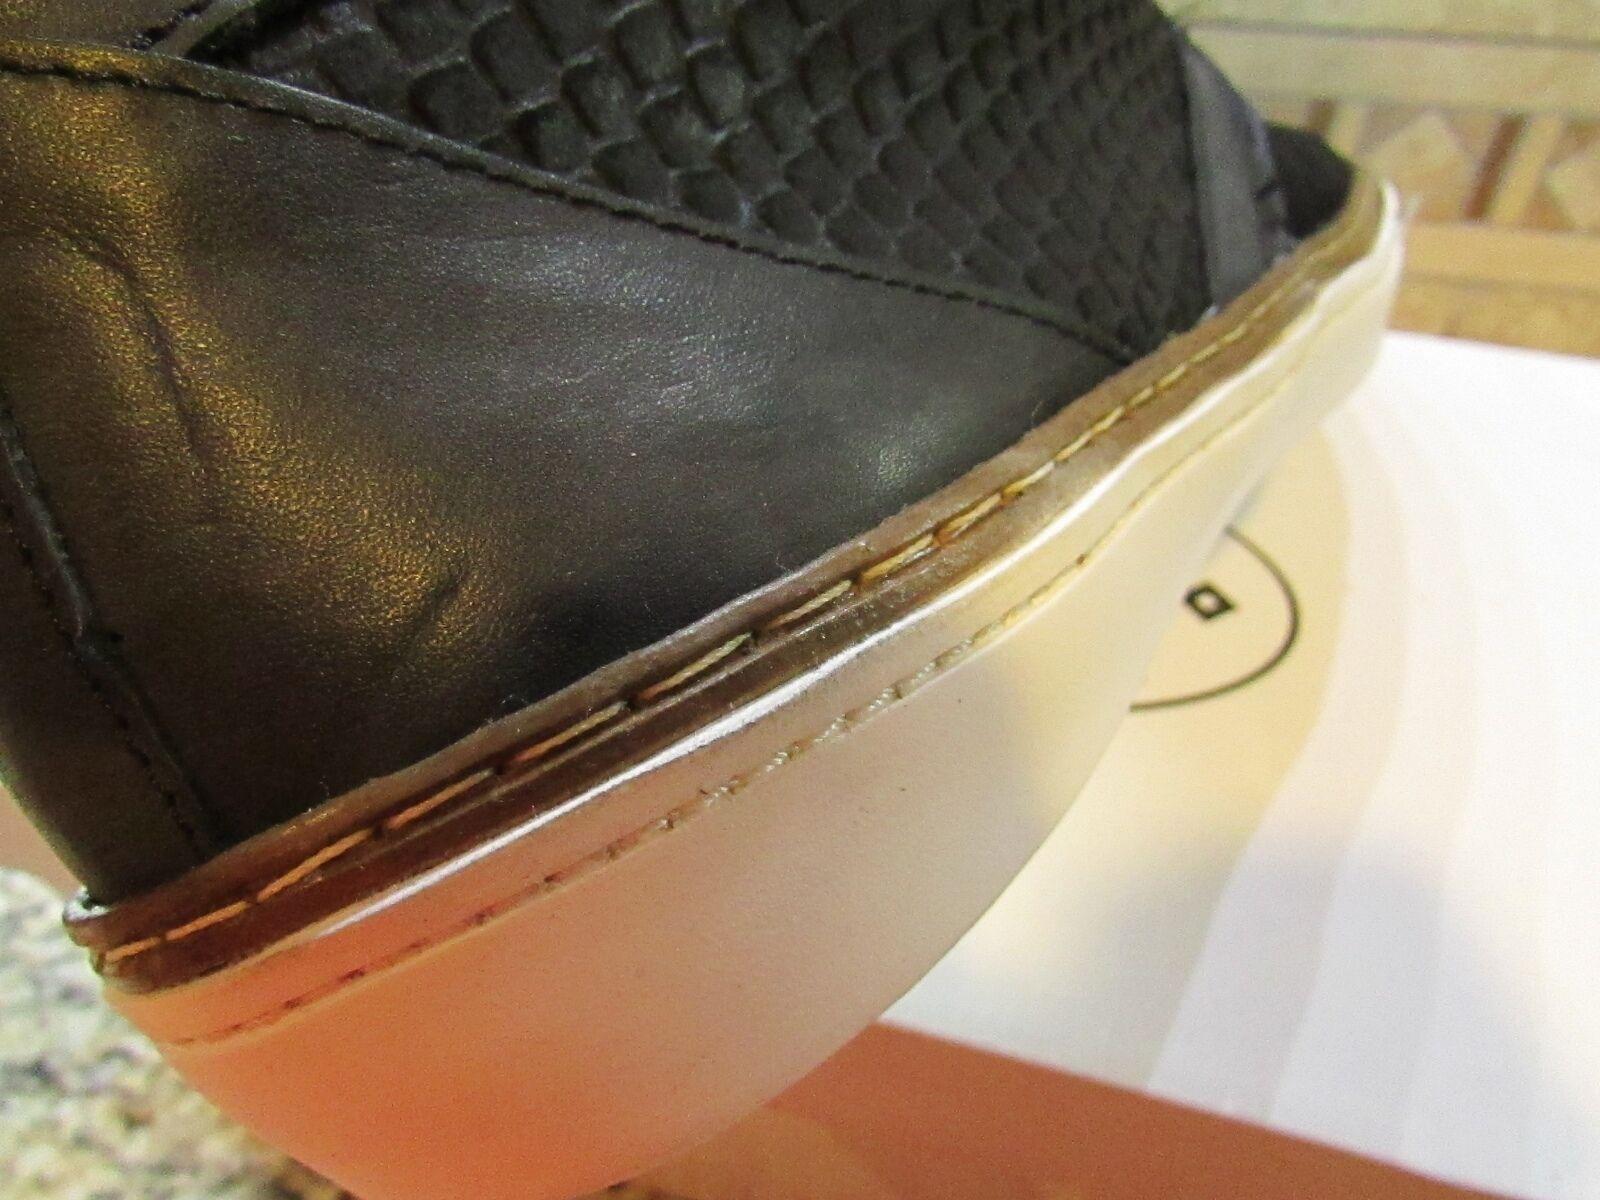 NEW STEVE MADDEN BRAZENN CHUKKA BOOTS  BOOT SHOES BLACK BLACK SHOES MENS 10.5 LEATHER 6203c2